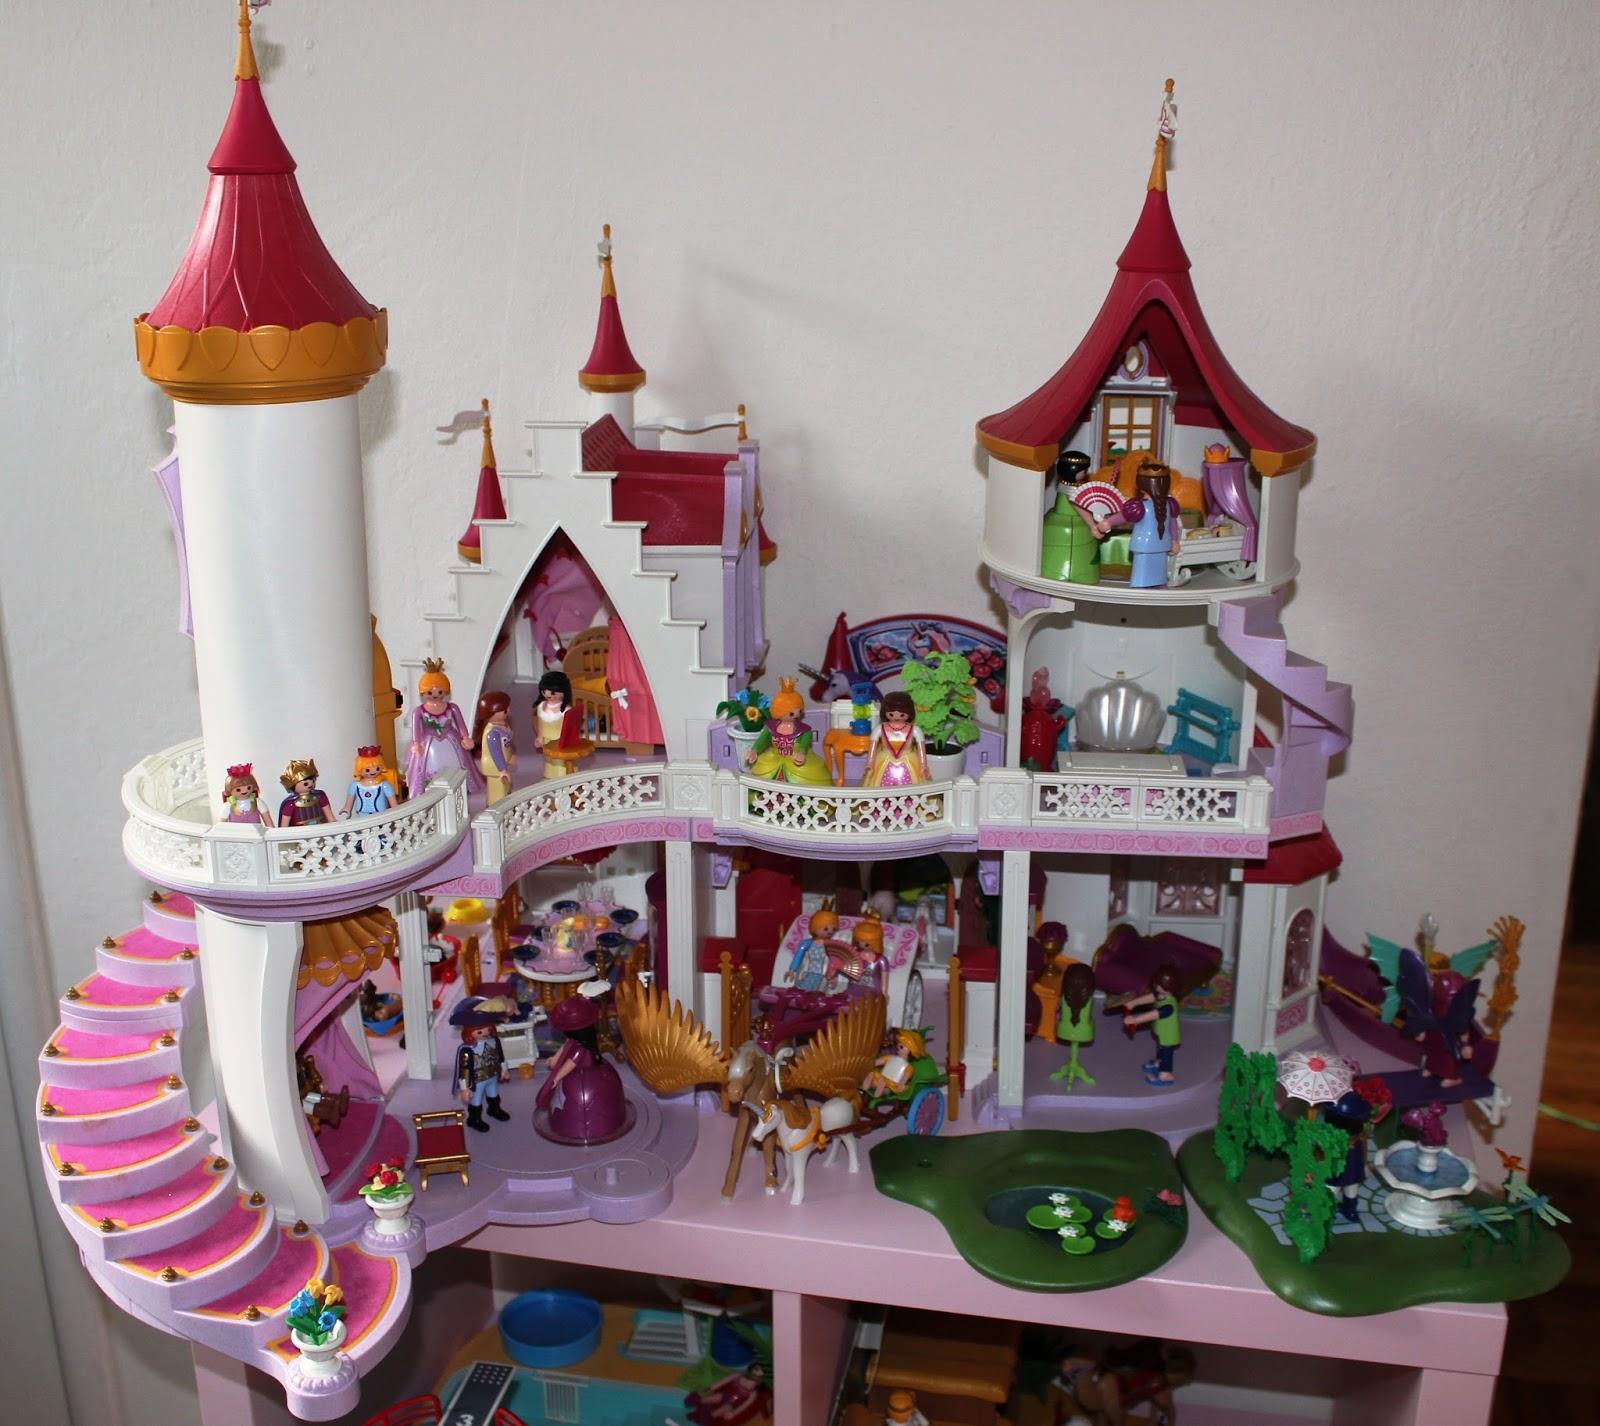 maison princesse playmobil chateau u montellier. Black Bedroom Furniture Sets. Home Design Ideas